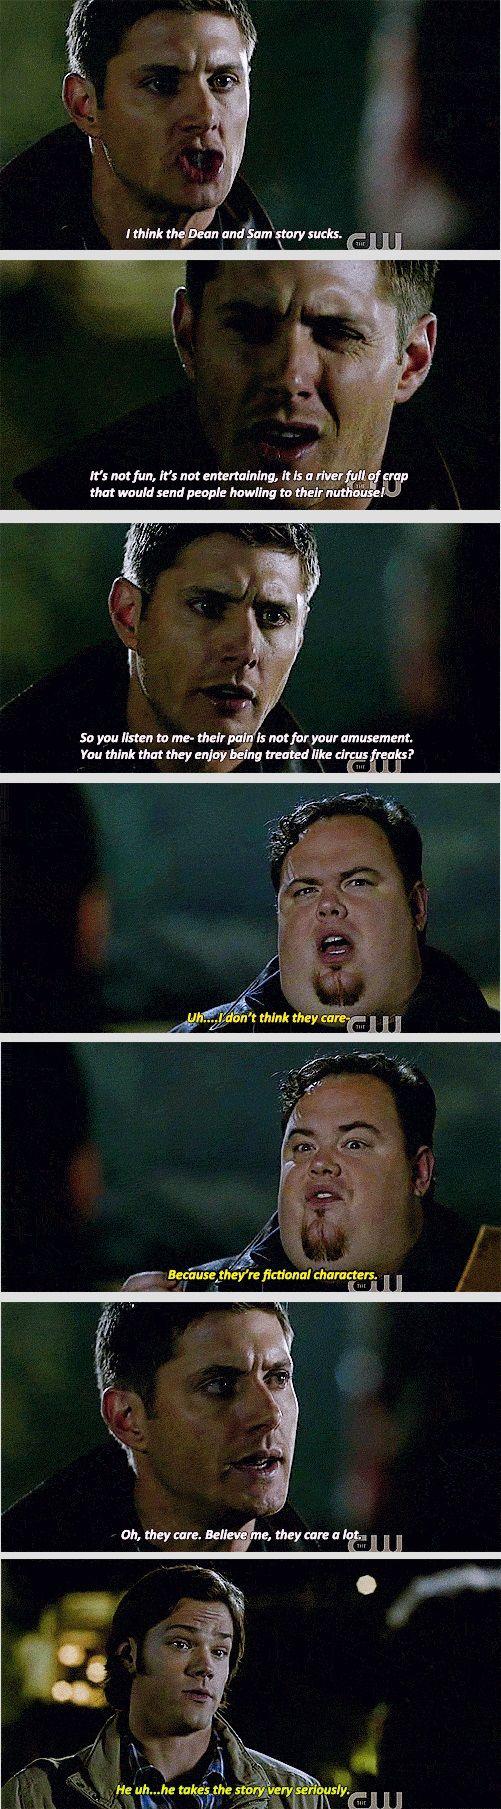 Dean is us.